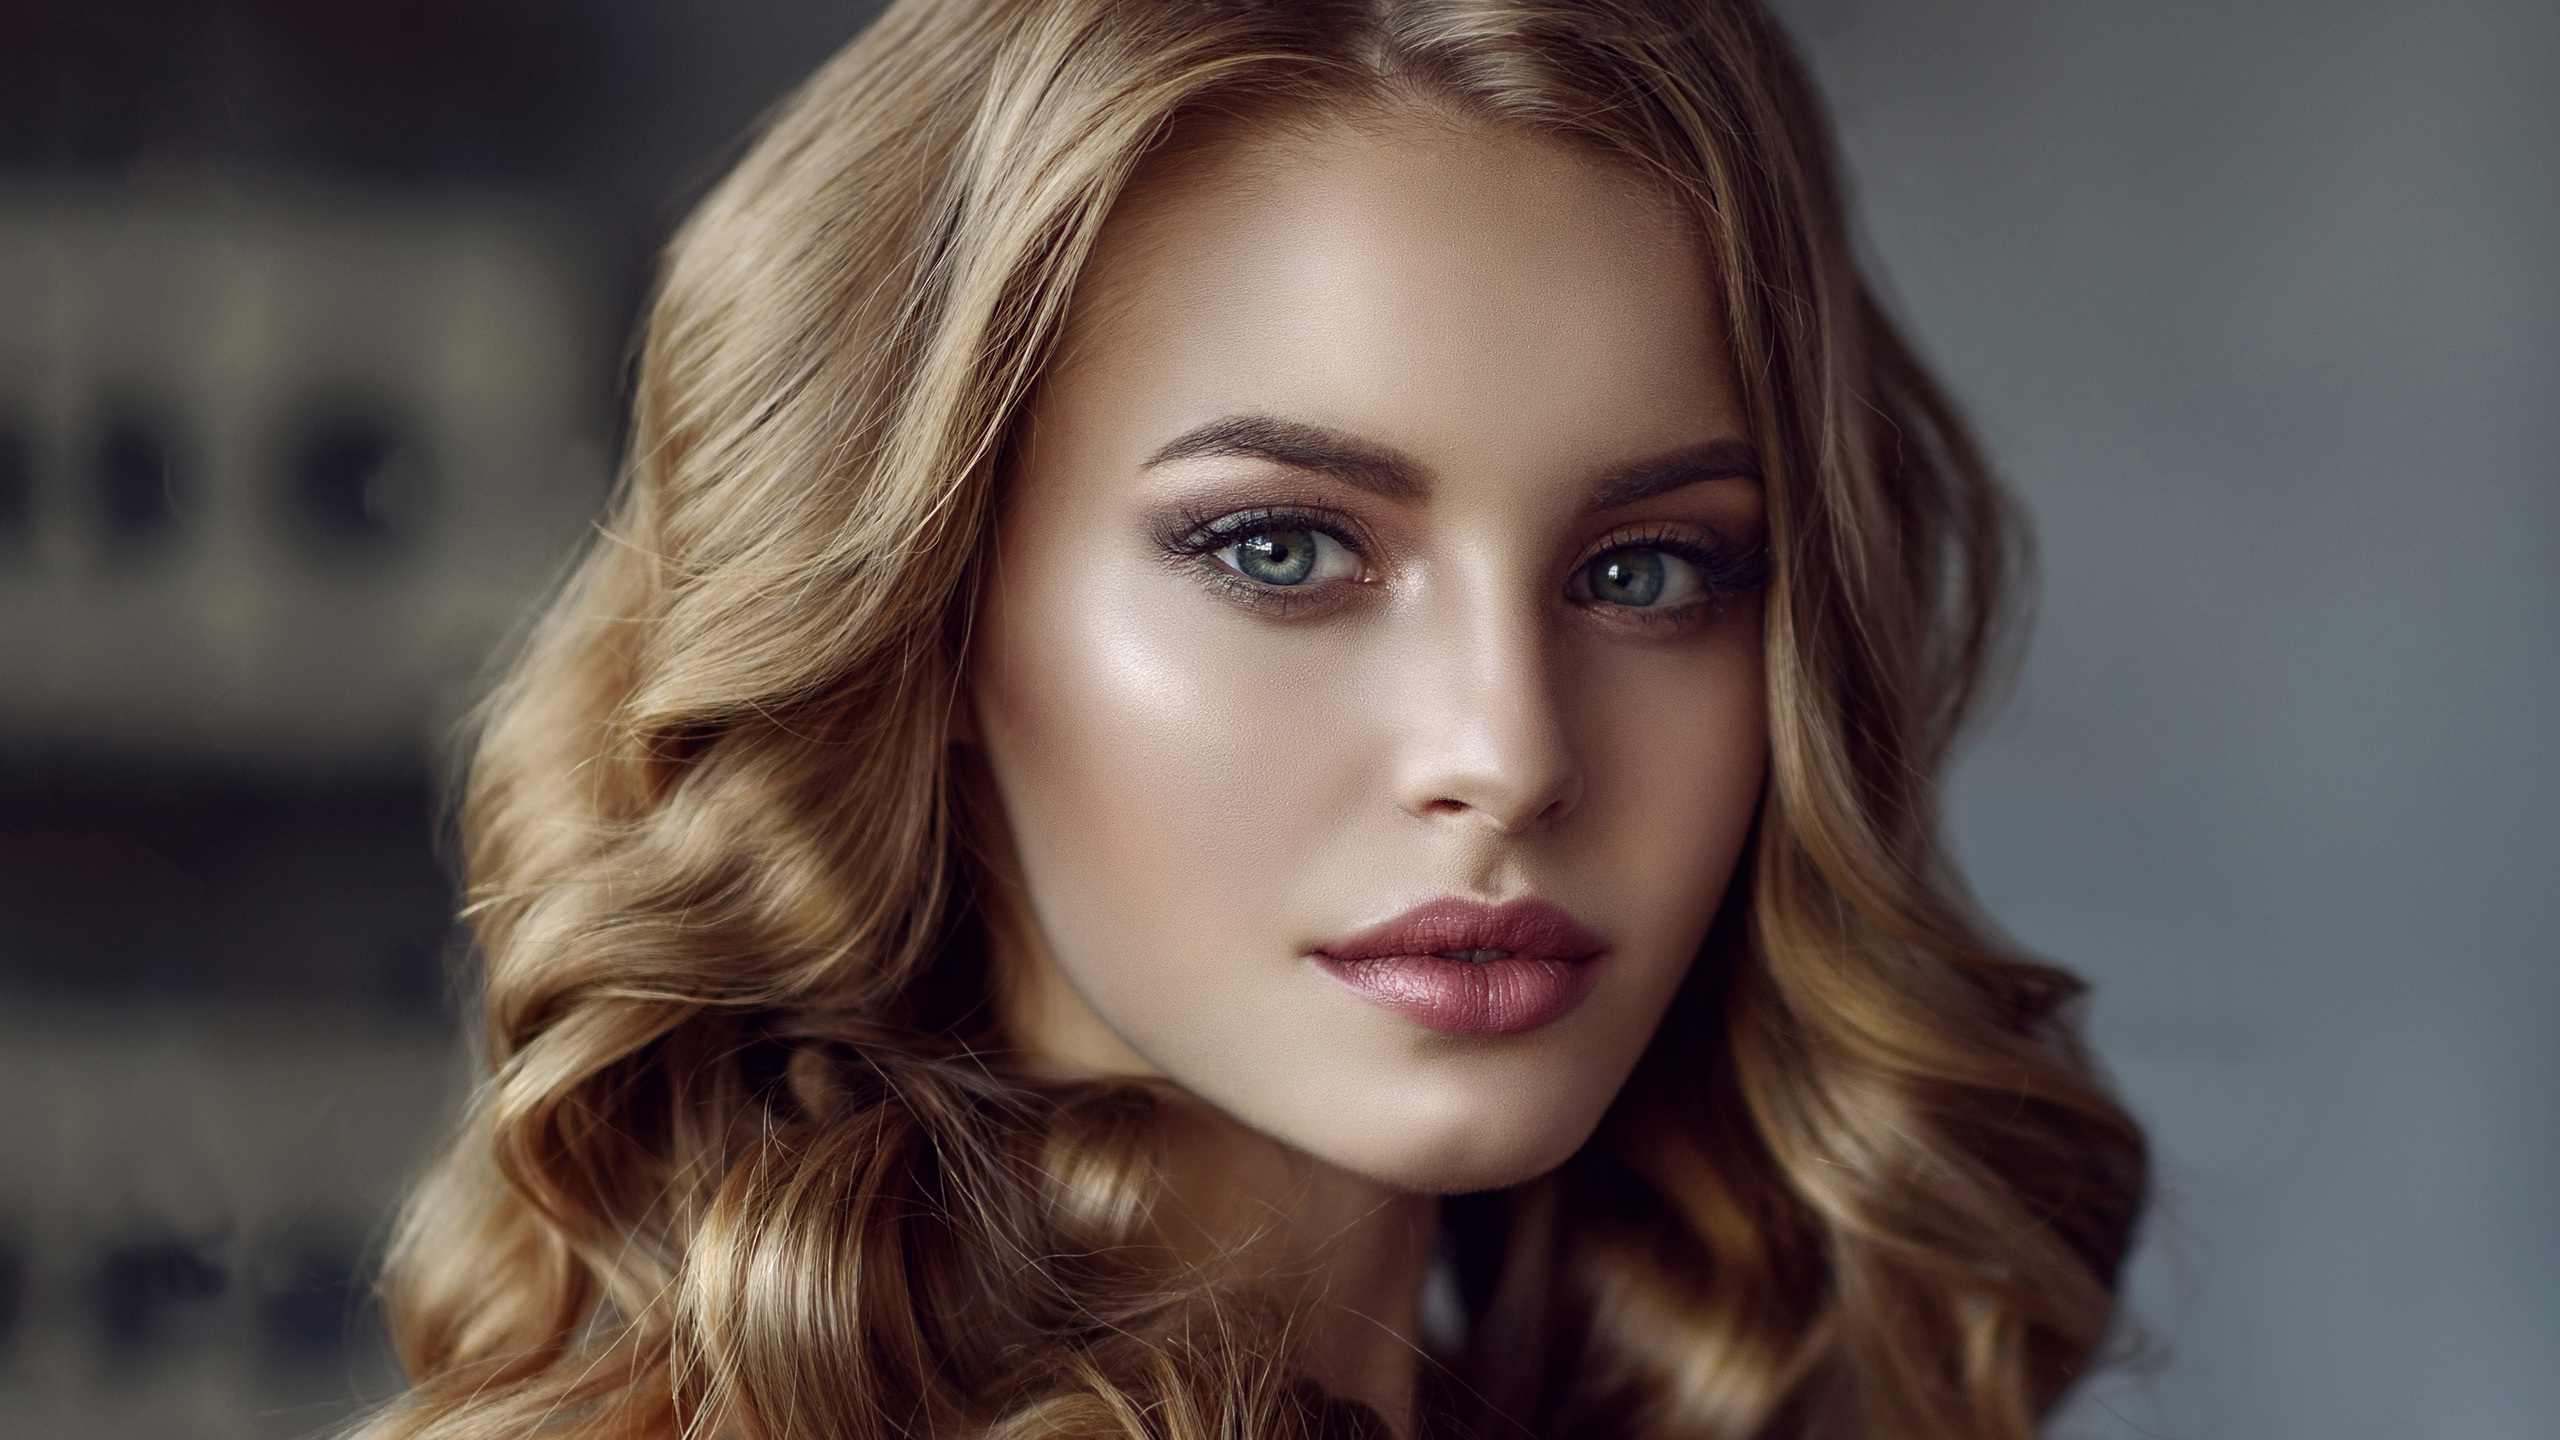 2560X1440 Beautiful Face Blonde Girl 4K 1440P Resolution -2343